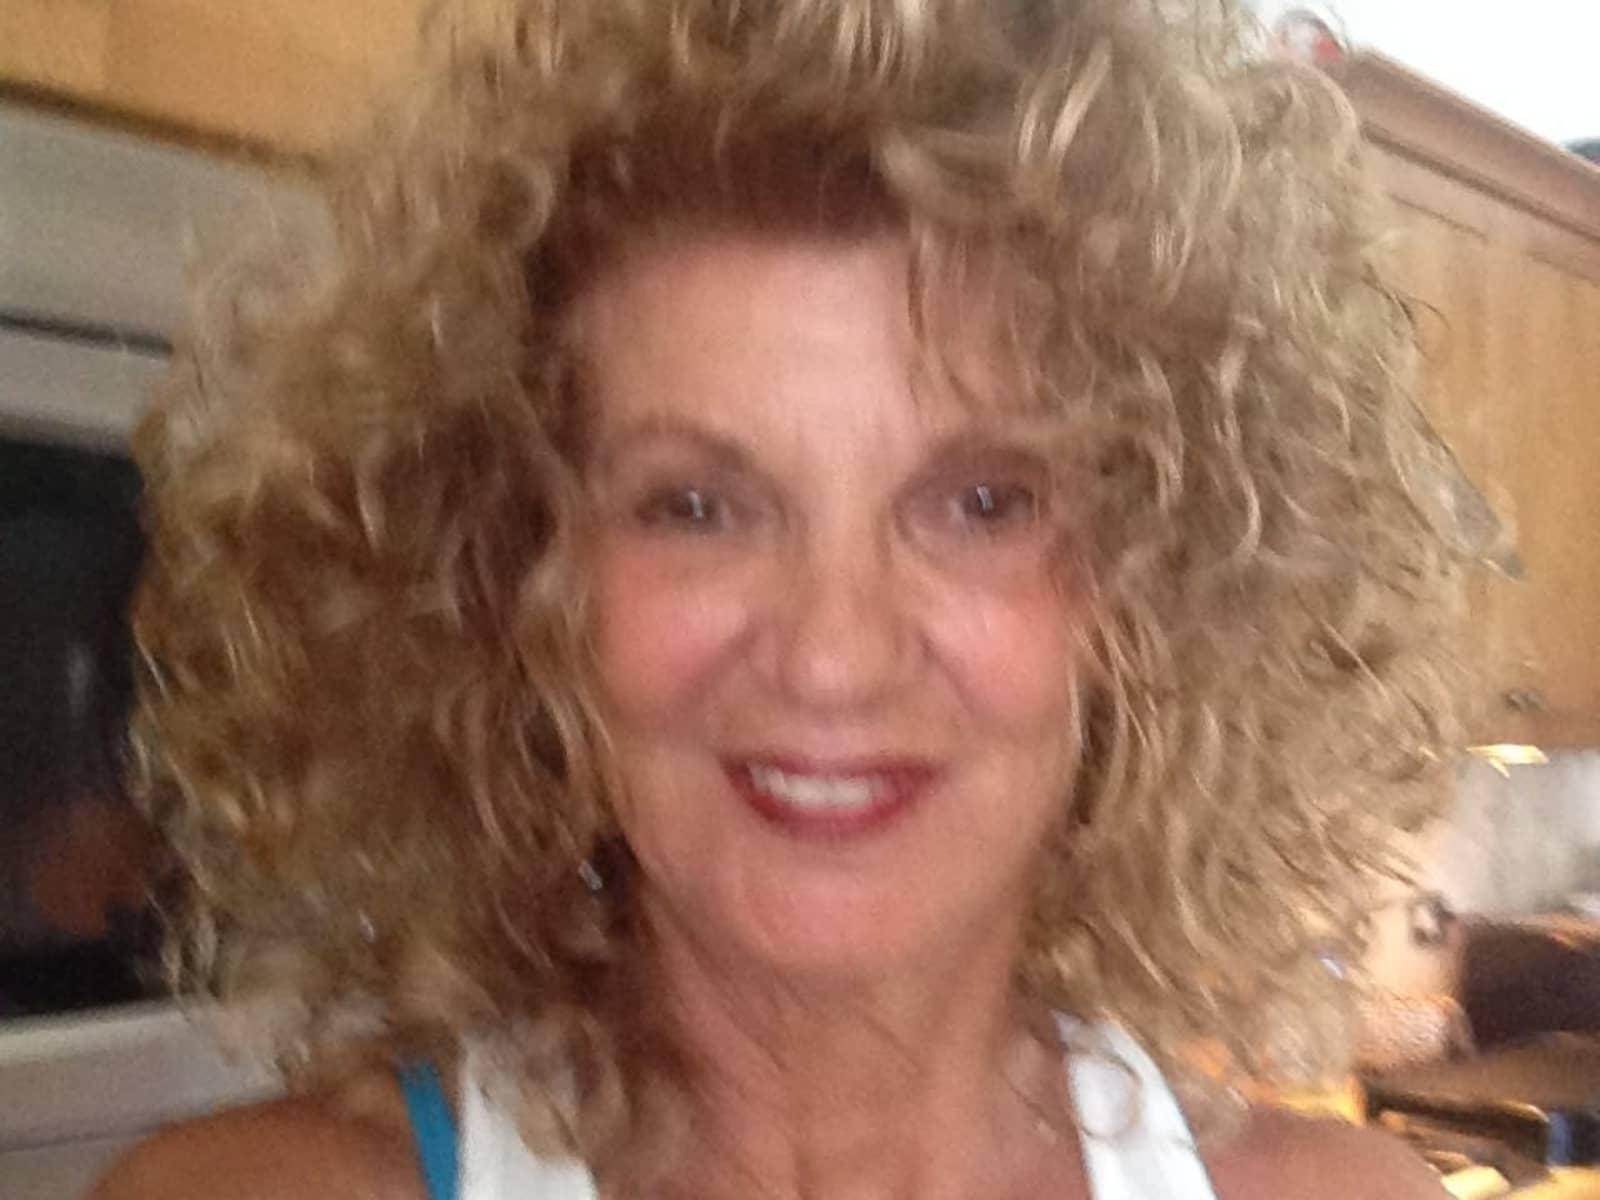 Leslie from Las Vegas, Nevada, United States